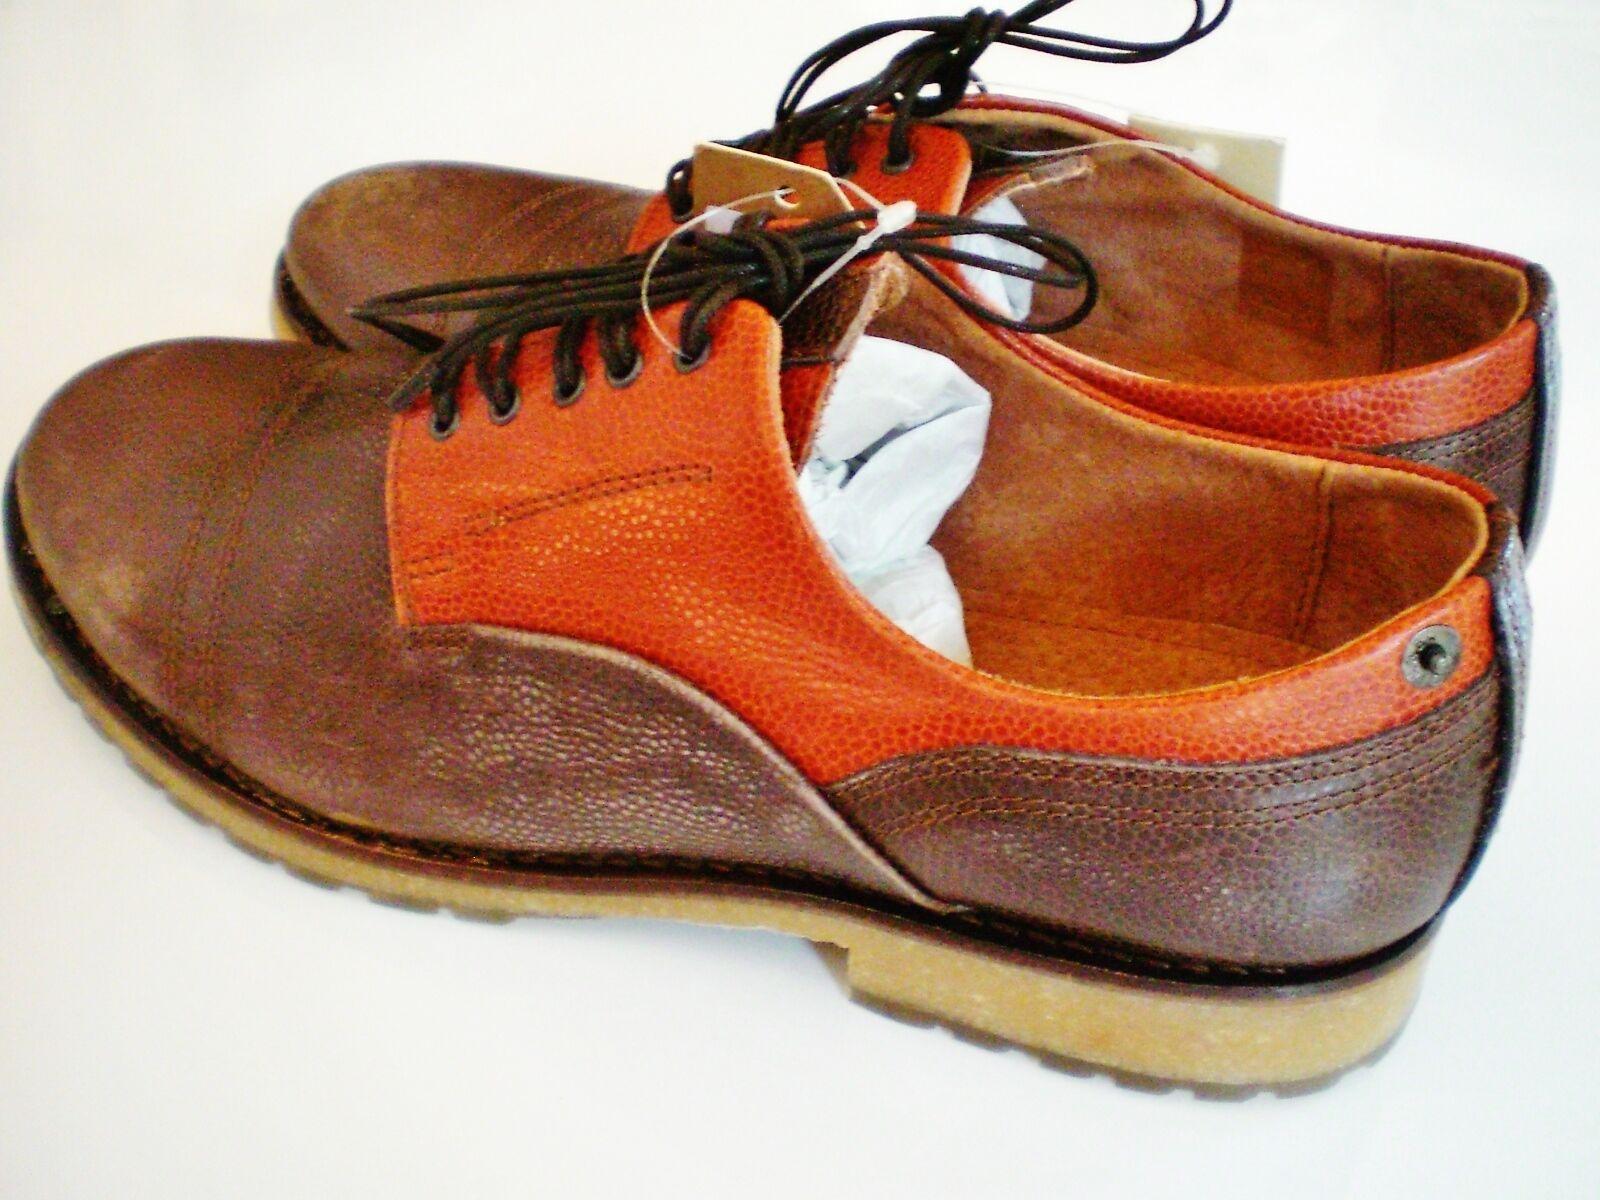 Original DIESEL Schuhe THE PURE SPLIT G01020 Boots Herrenschuhe Grösse 43 Leder